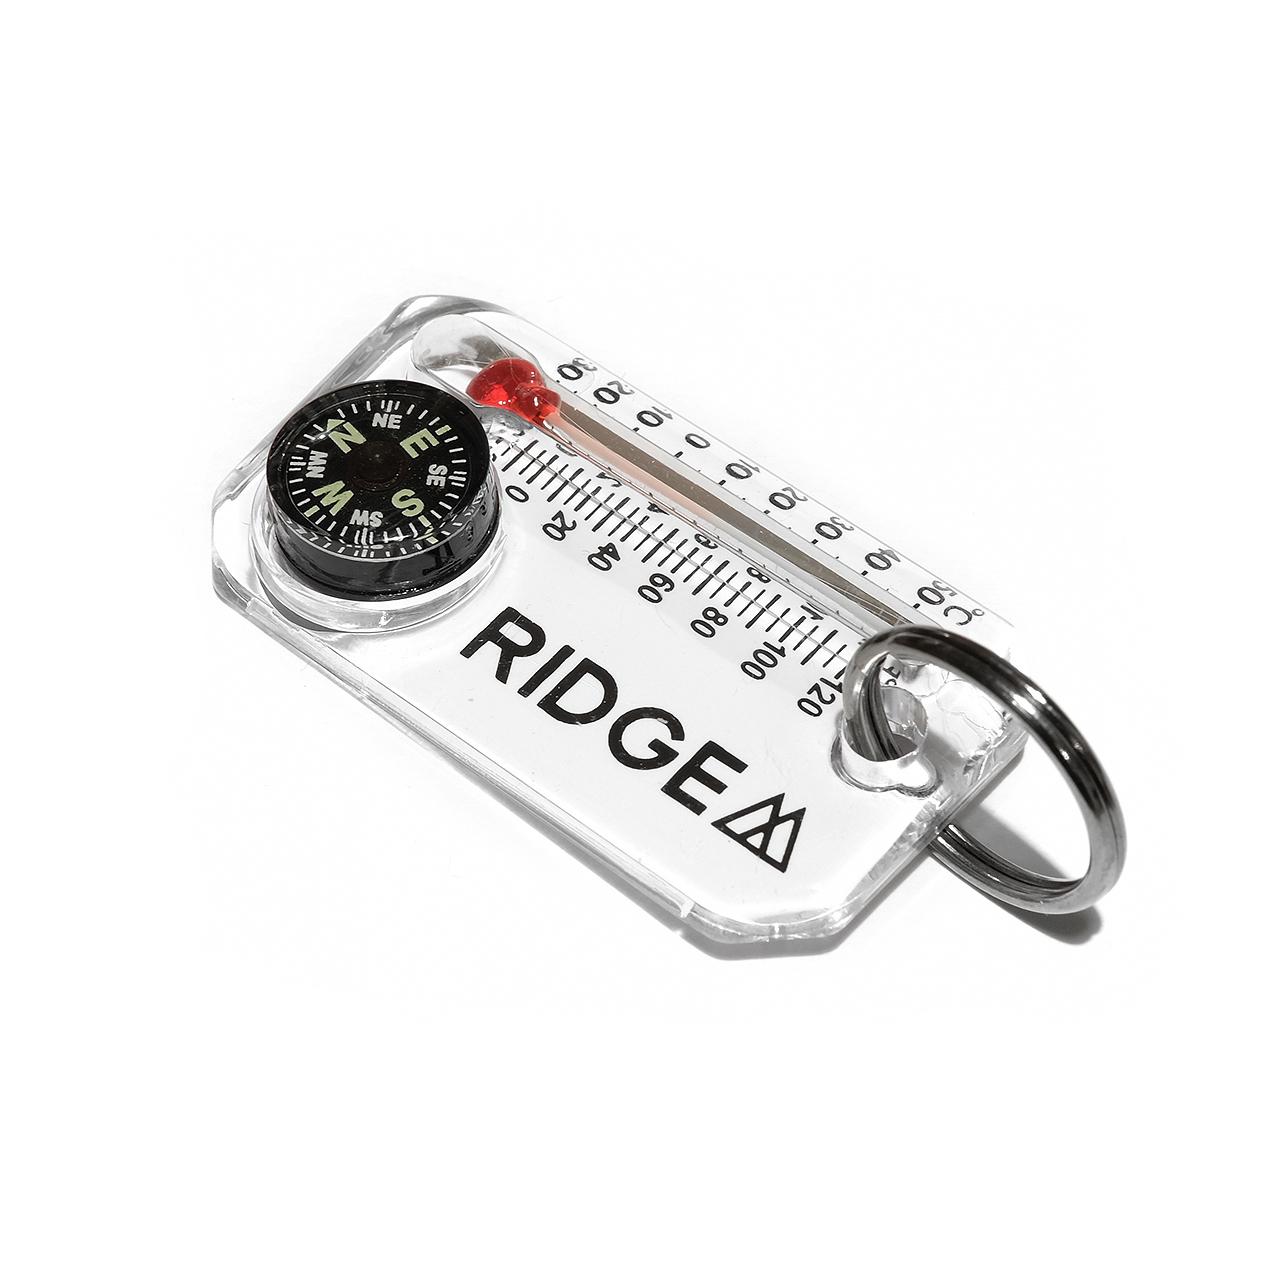 SunCompany Therm-o-compass RIDGE MOUNTAIN GEAR Ver.